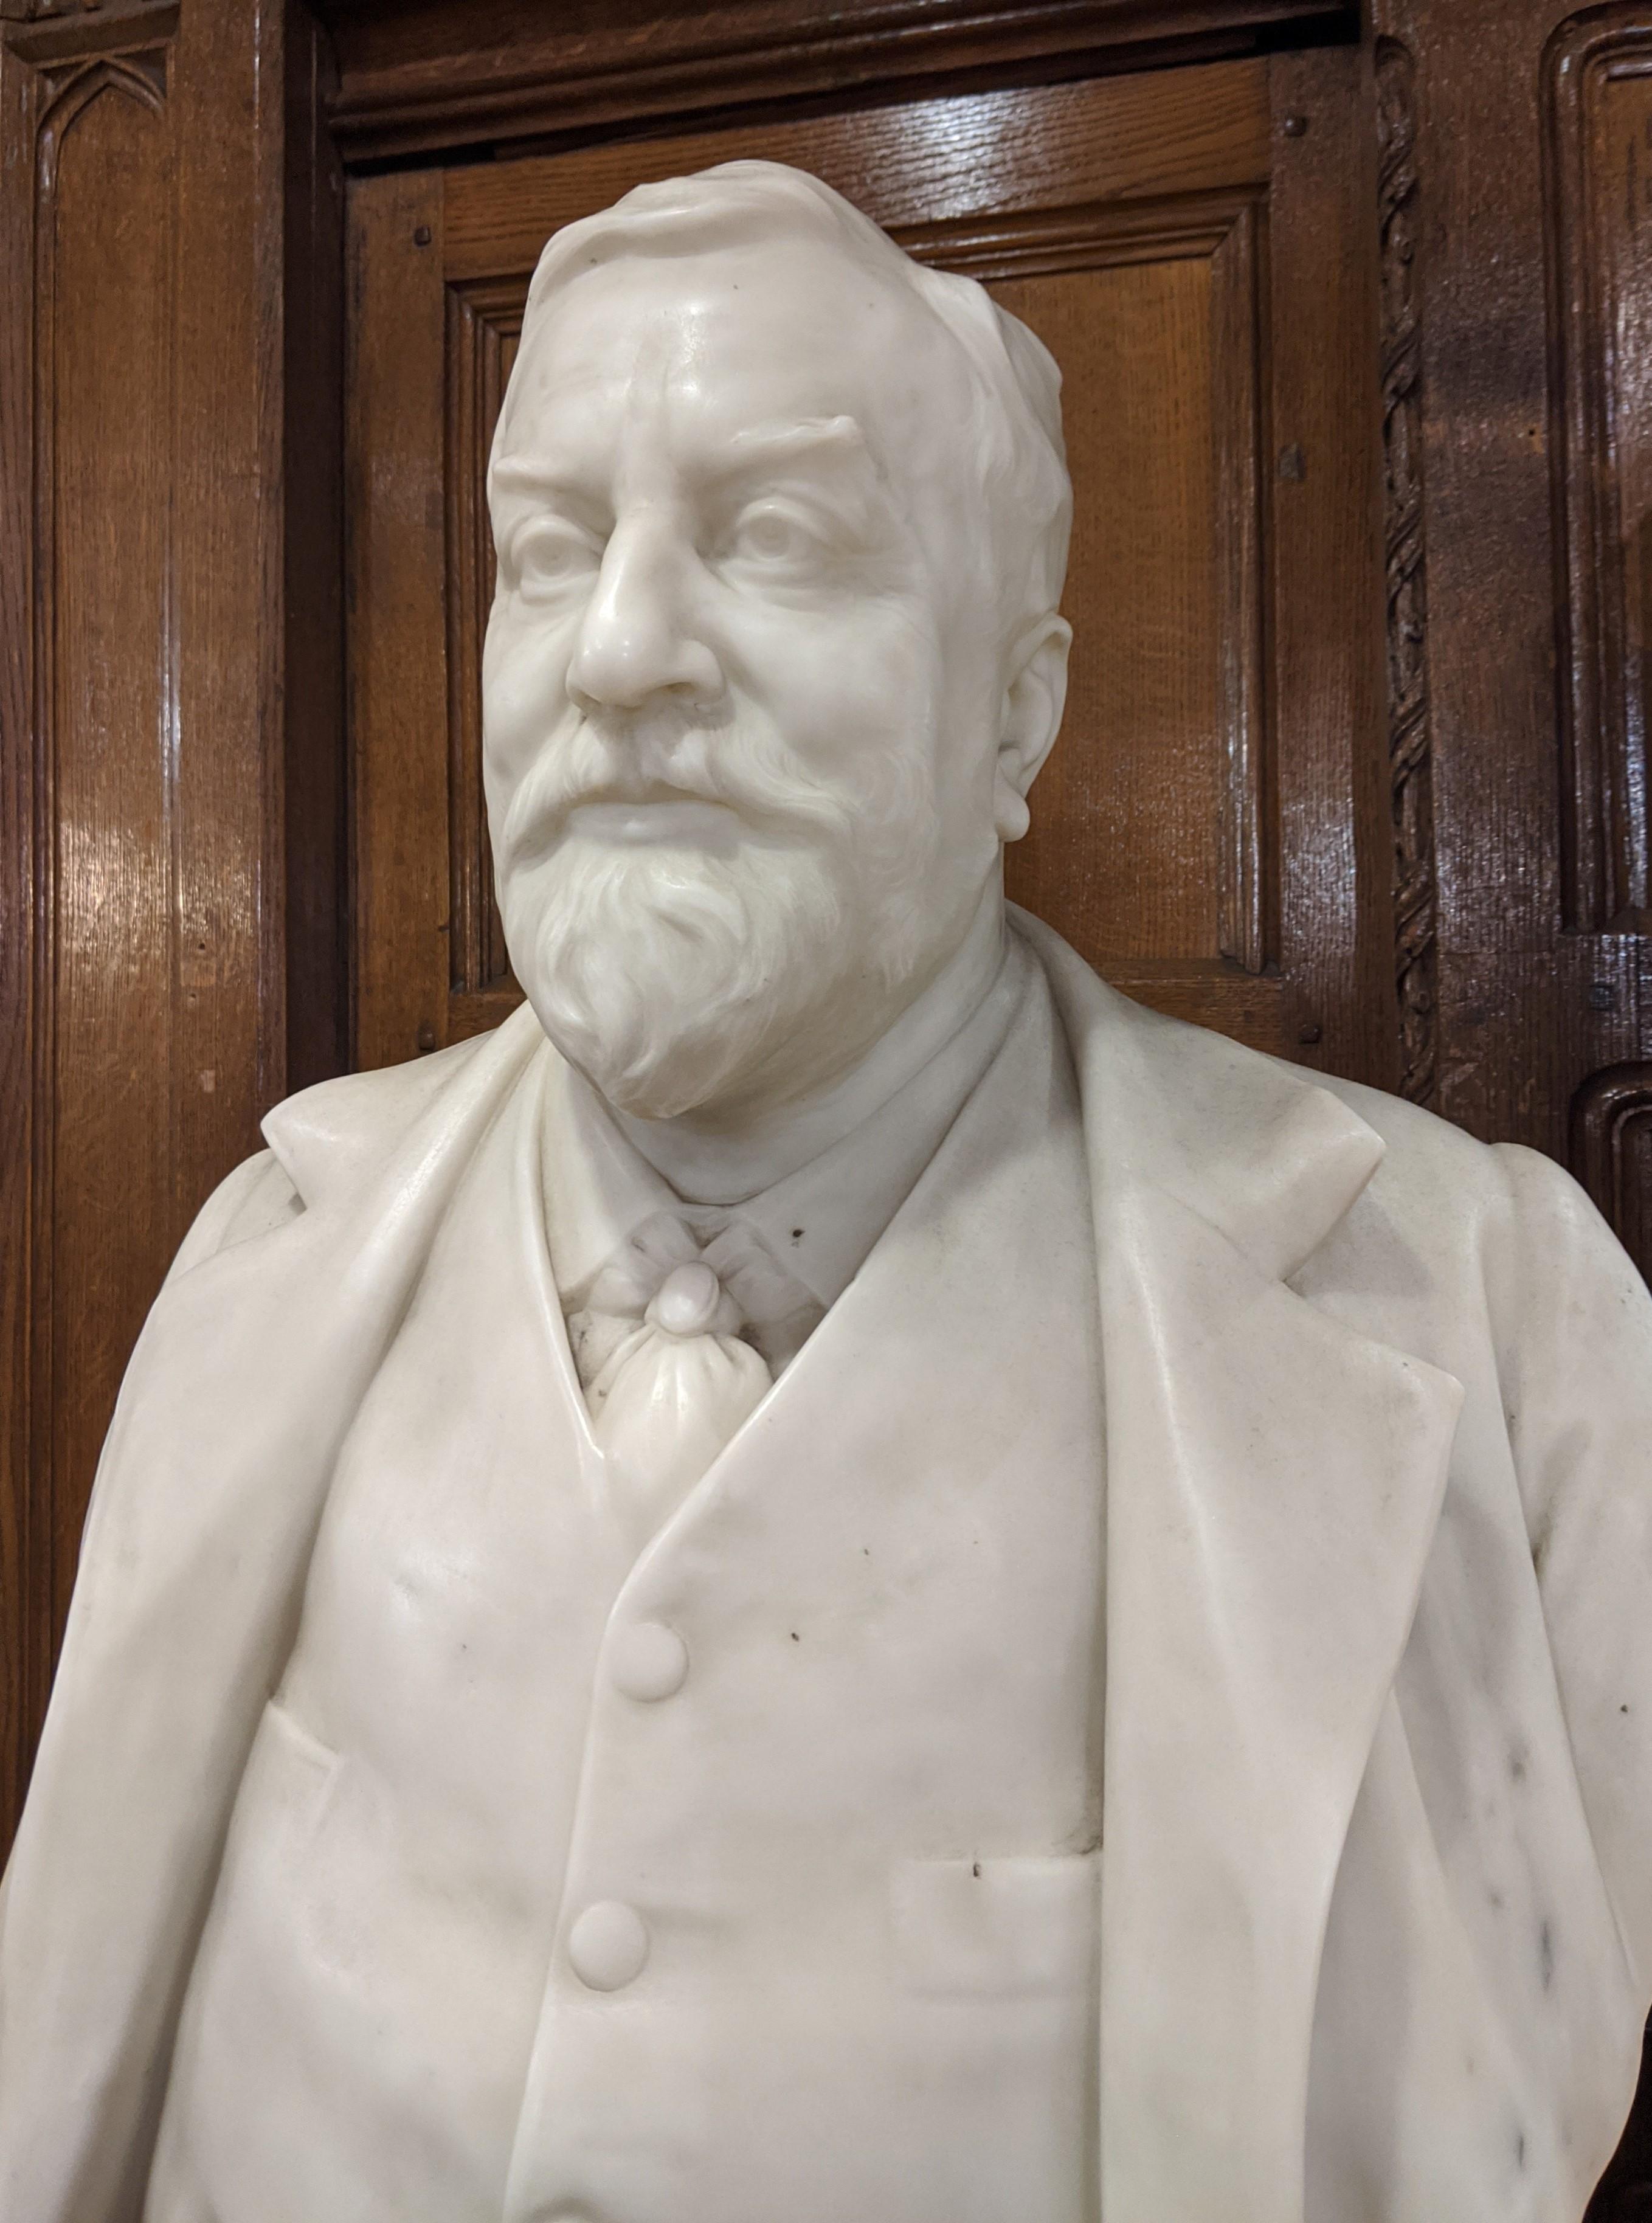 Buste van Arthur Liberty. Foto Hsq7278, 2019